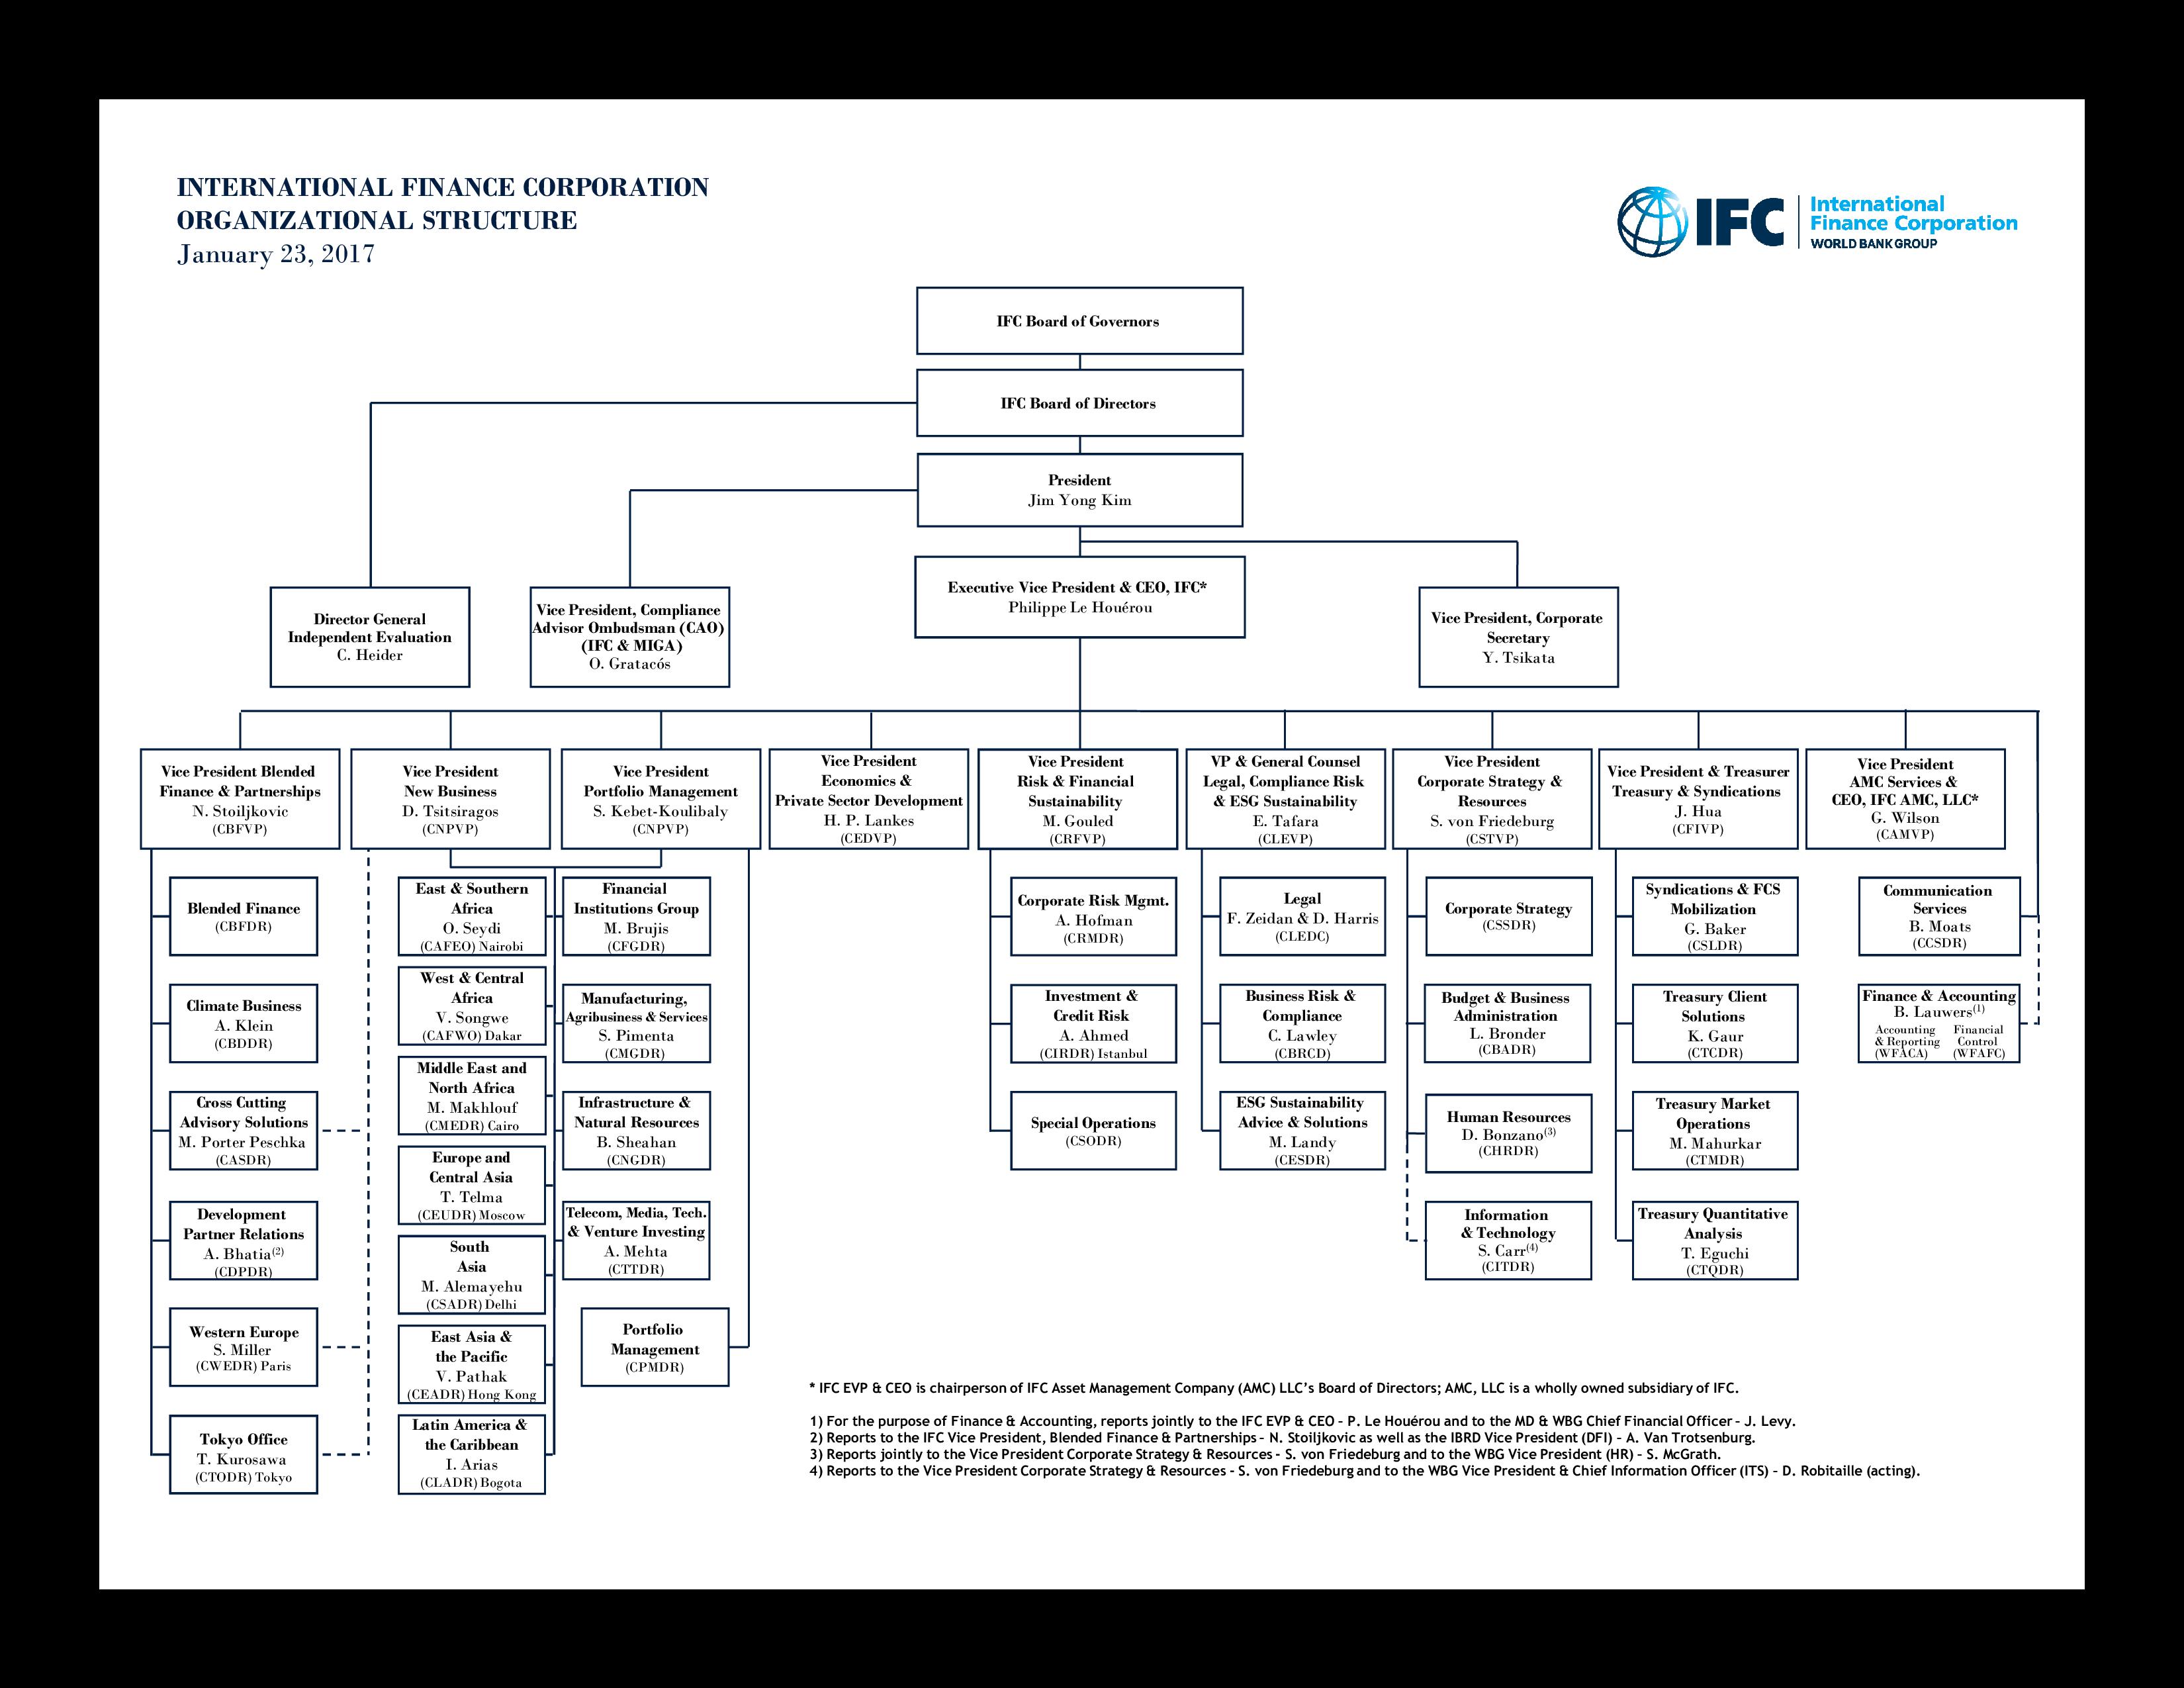 International Finance Corporation Organizational Chart Templates At Allbusinesstemplates Com